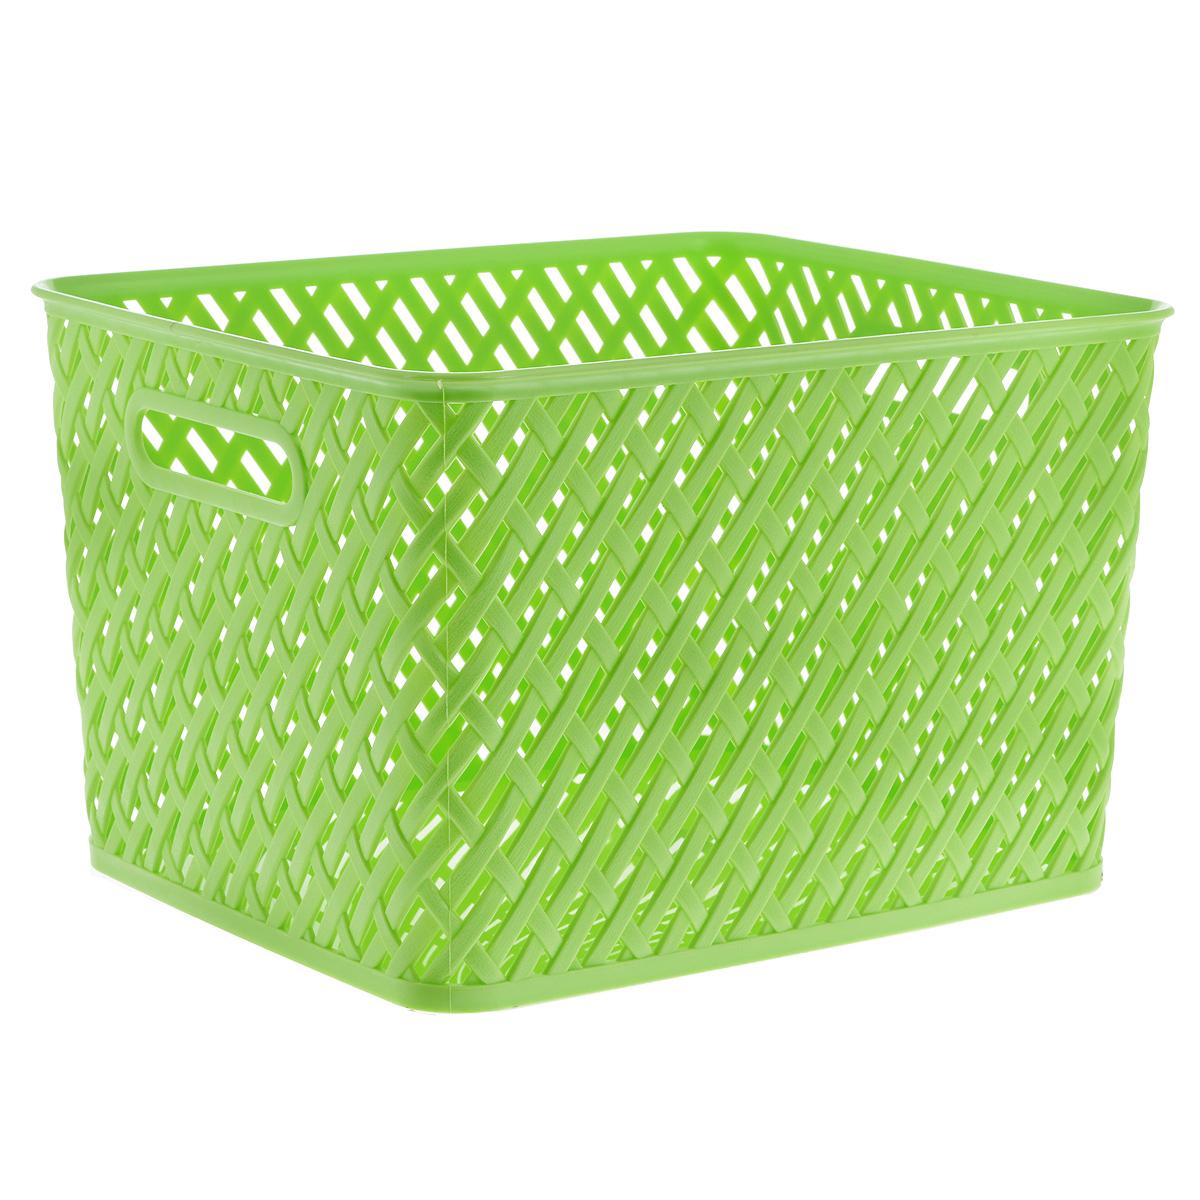 Корзина Альтернатива Плетенка, цвет: салатовый, 35 х 29 х 22,5 см корзина для хранения альтернатива вдохновение цвет салатовый 26 5 х 16 5 х 10 см